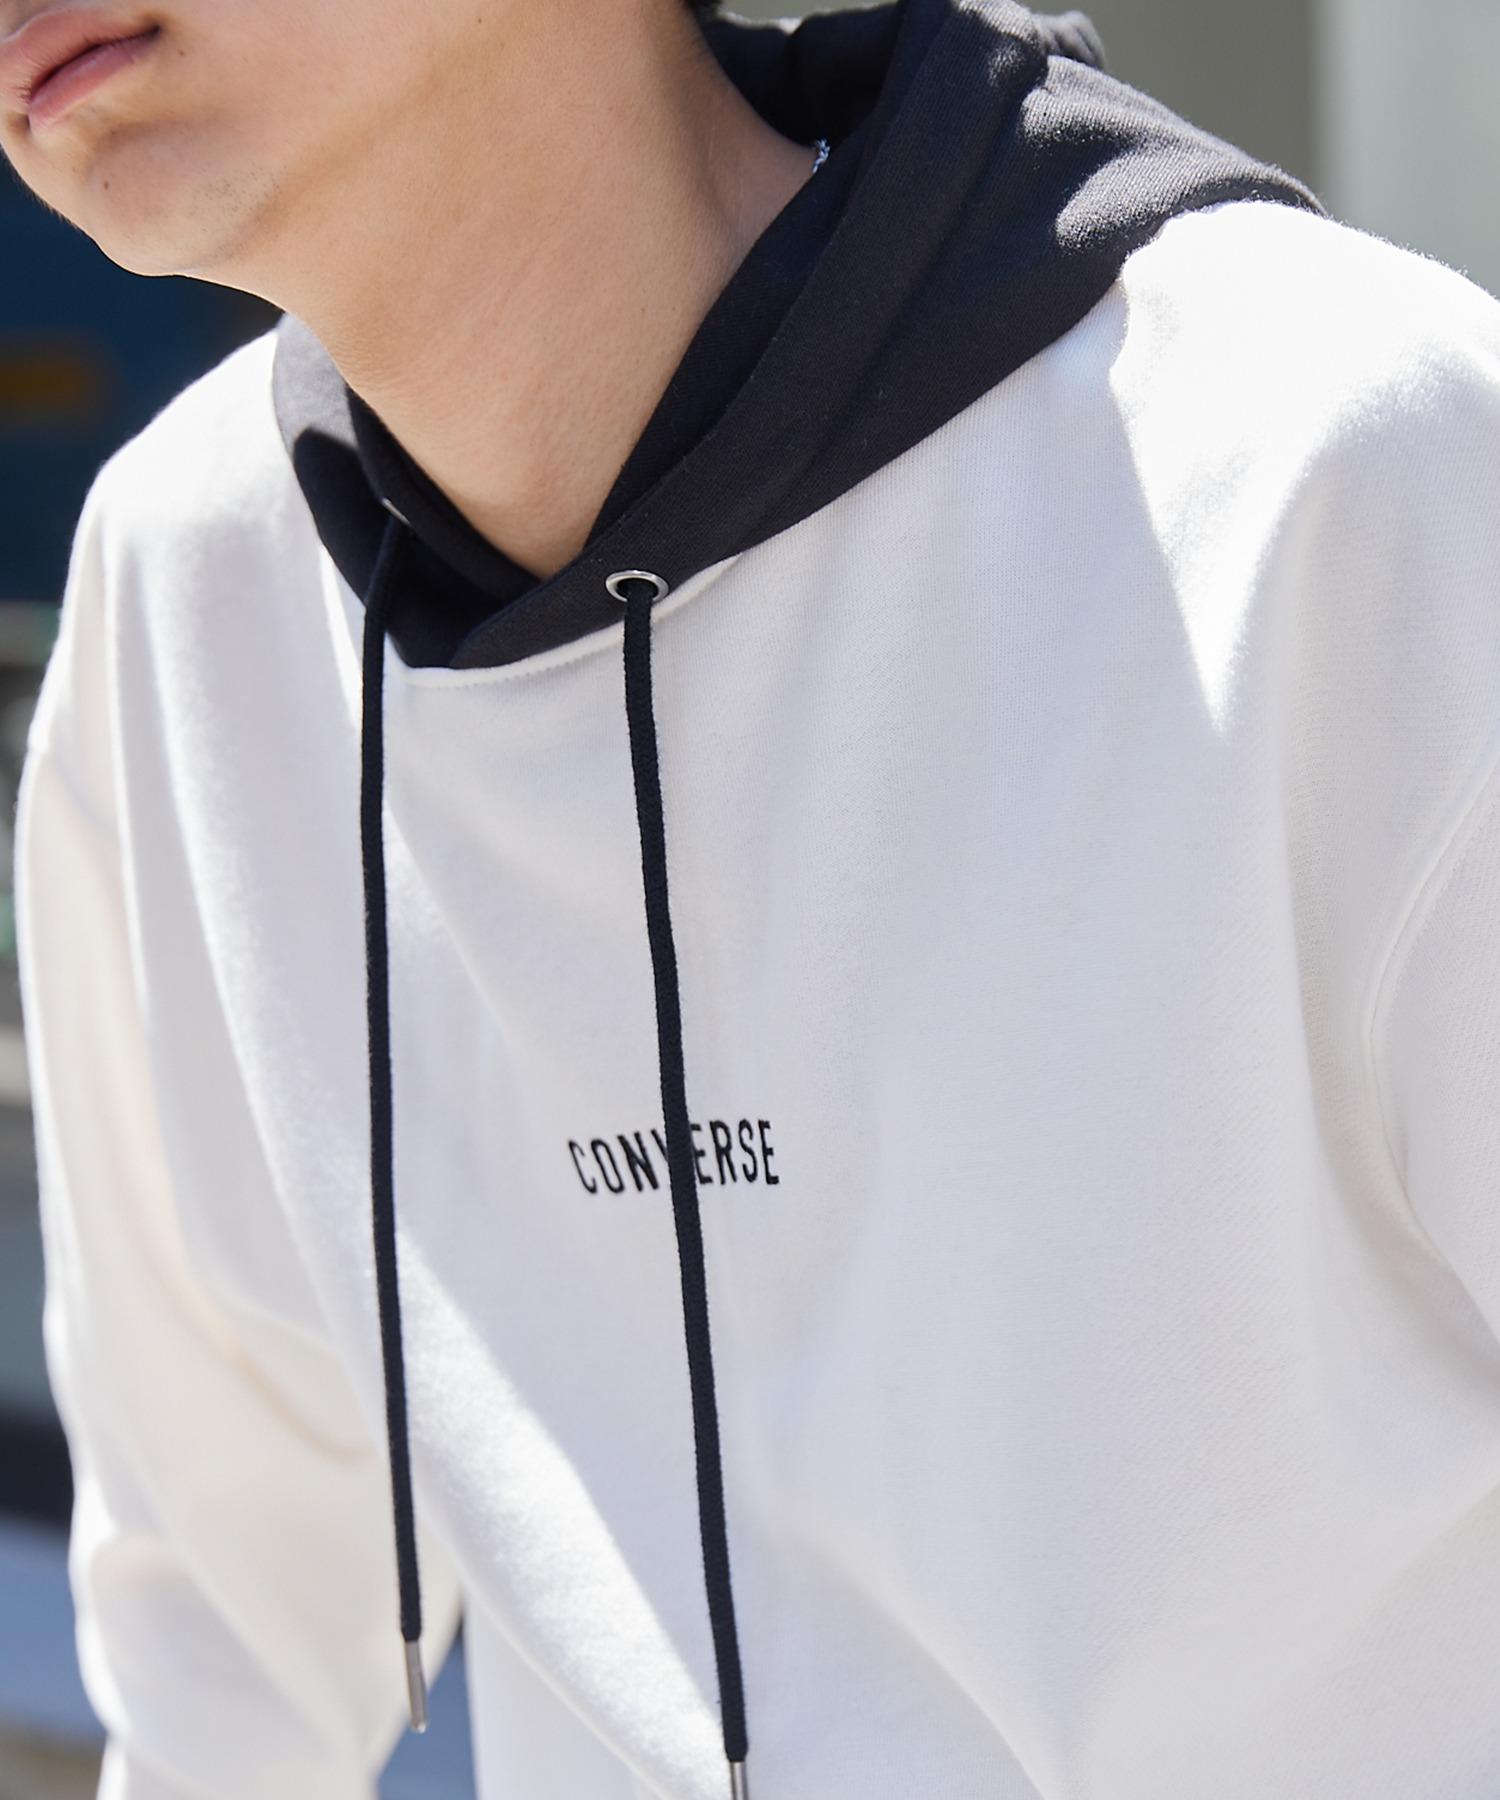 CONVERSE/コンバース 別注 フロント/袖刺繍 オーバーサイズプルオーバーパーカー